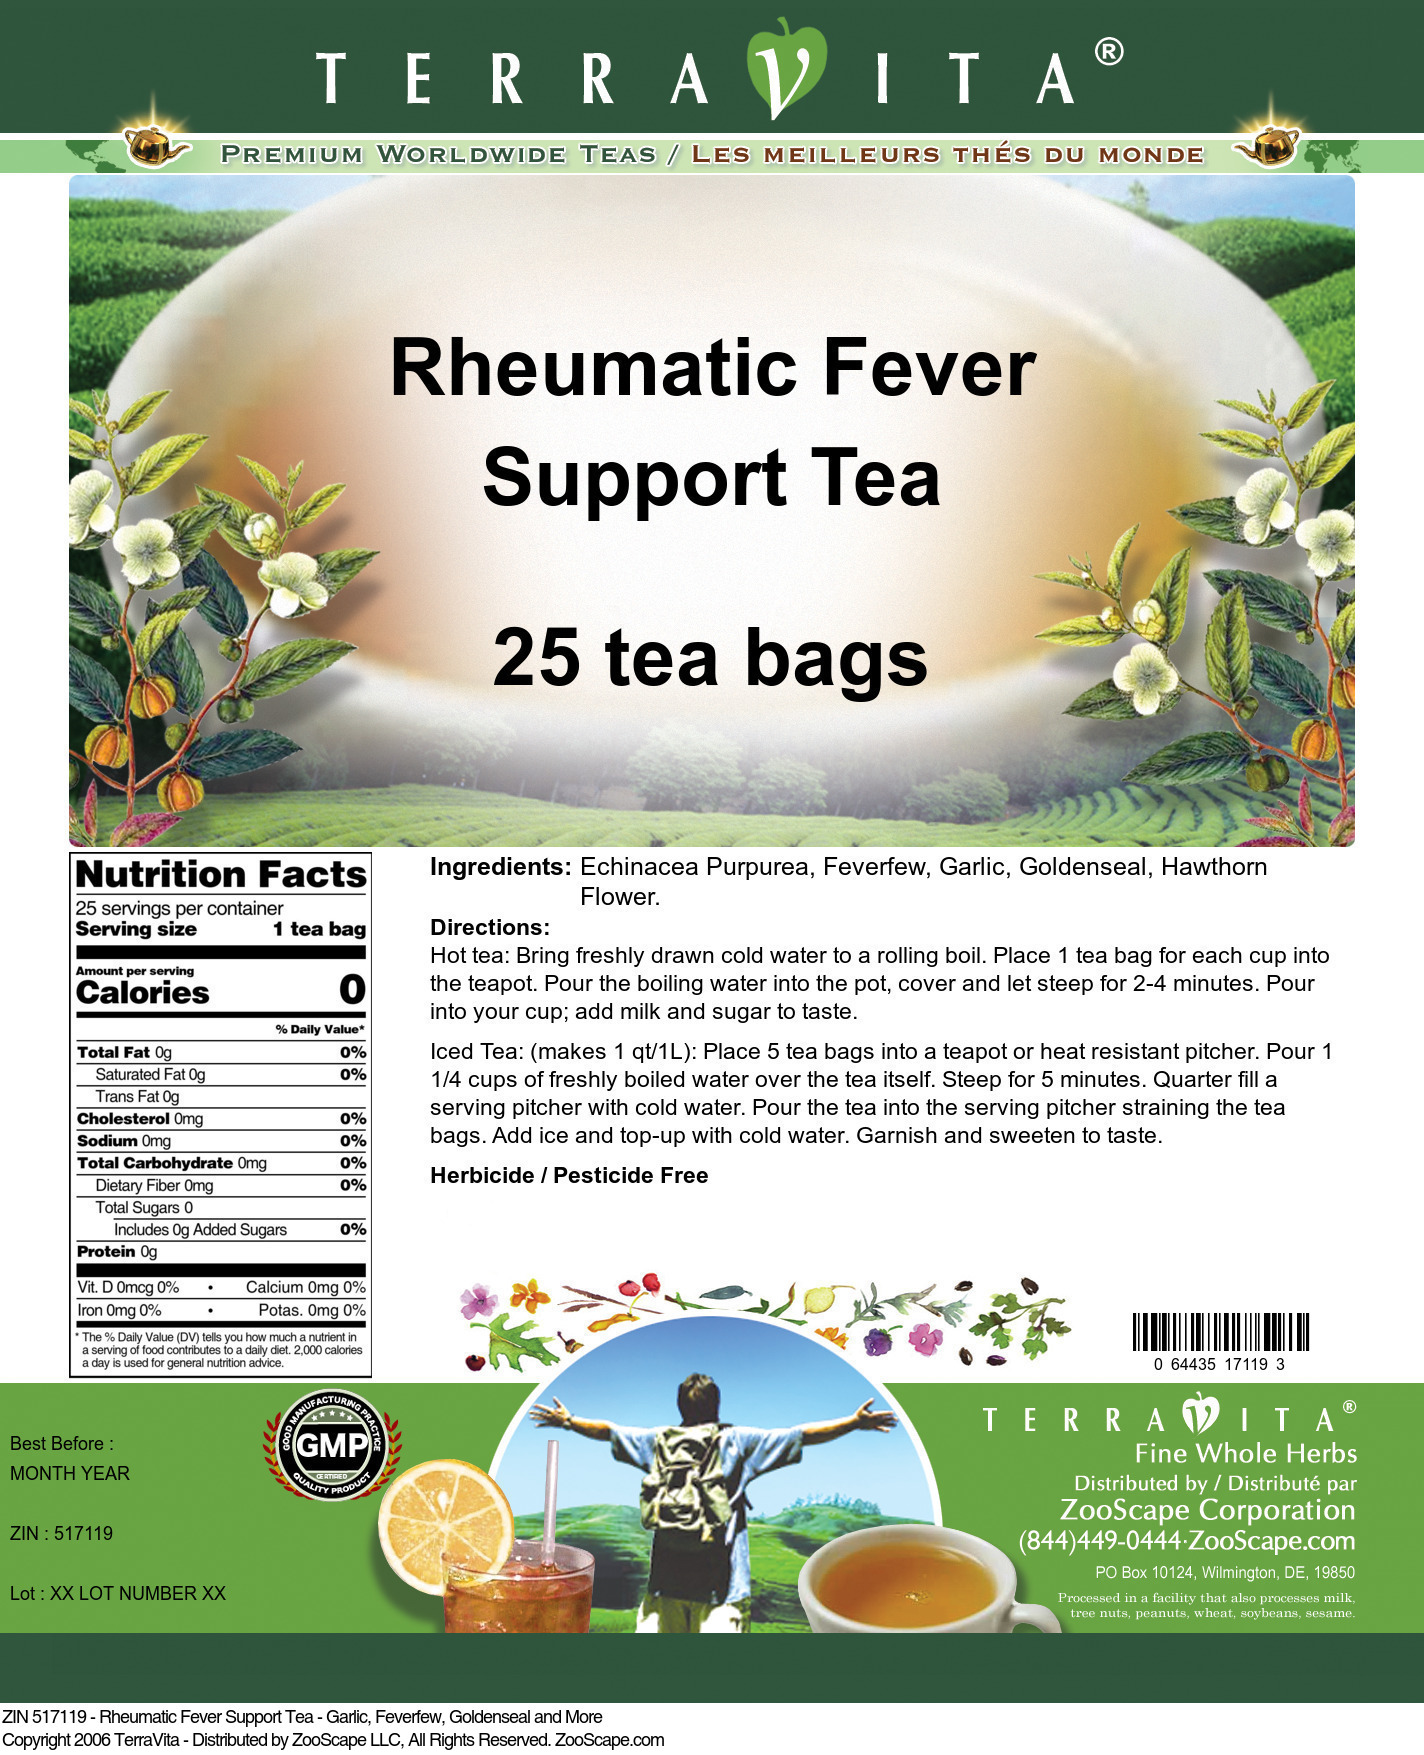 Rheumatic Fever Support